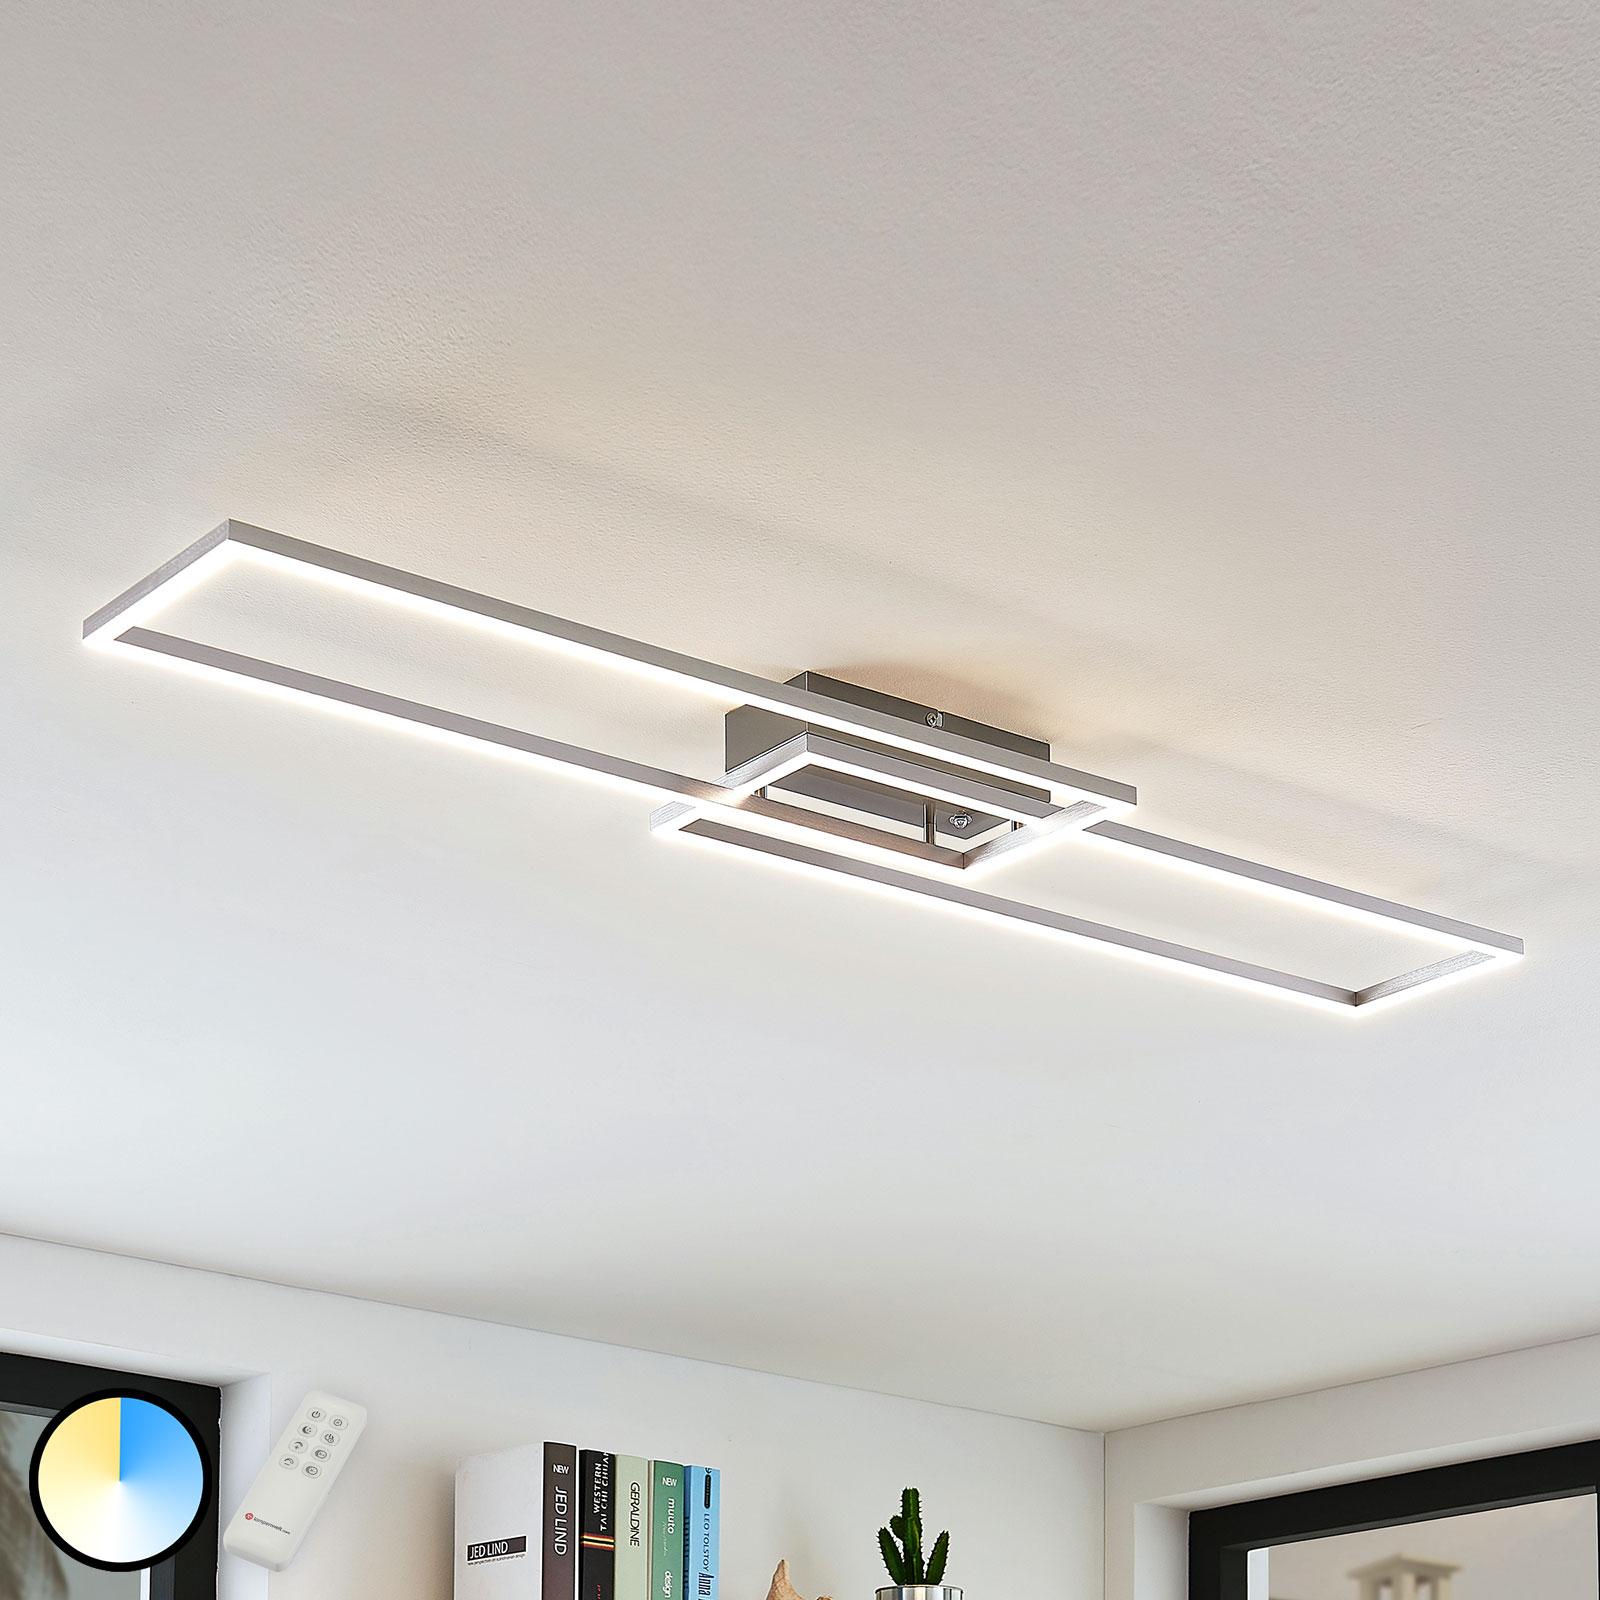 LED-taklampe Quadra, dimbar, 2 lyskilder, 110 cm